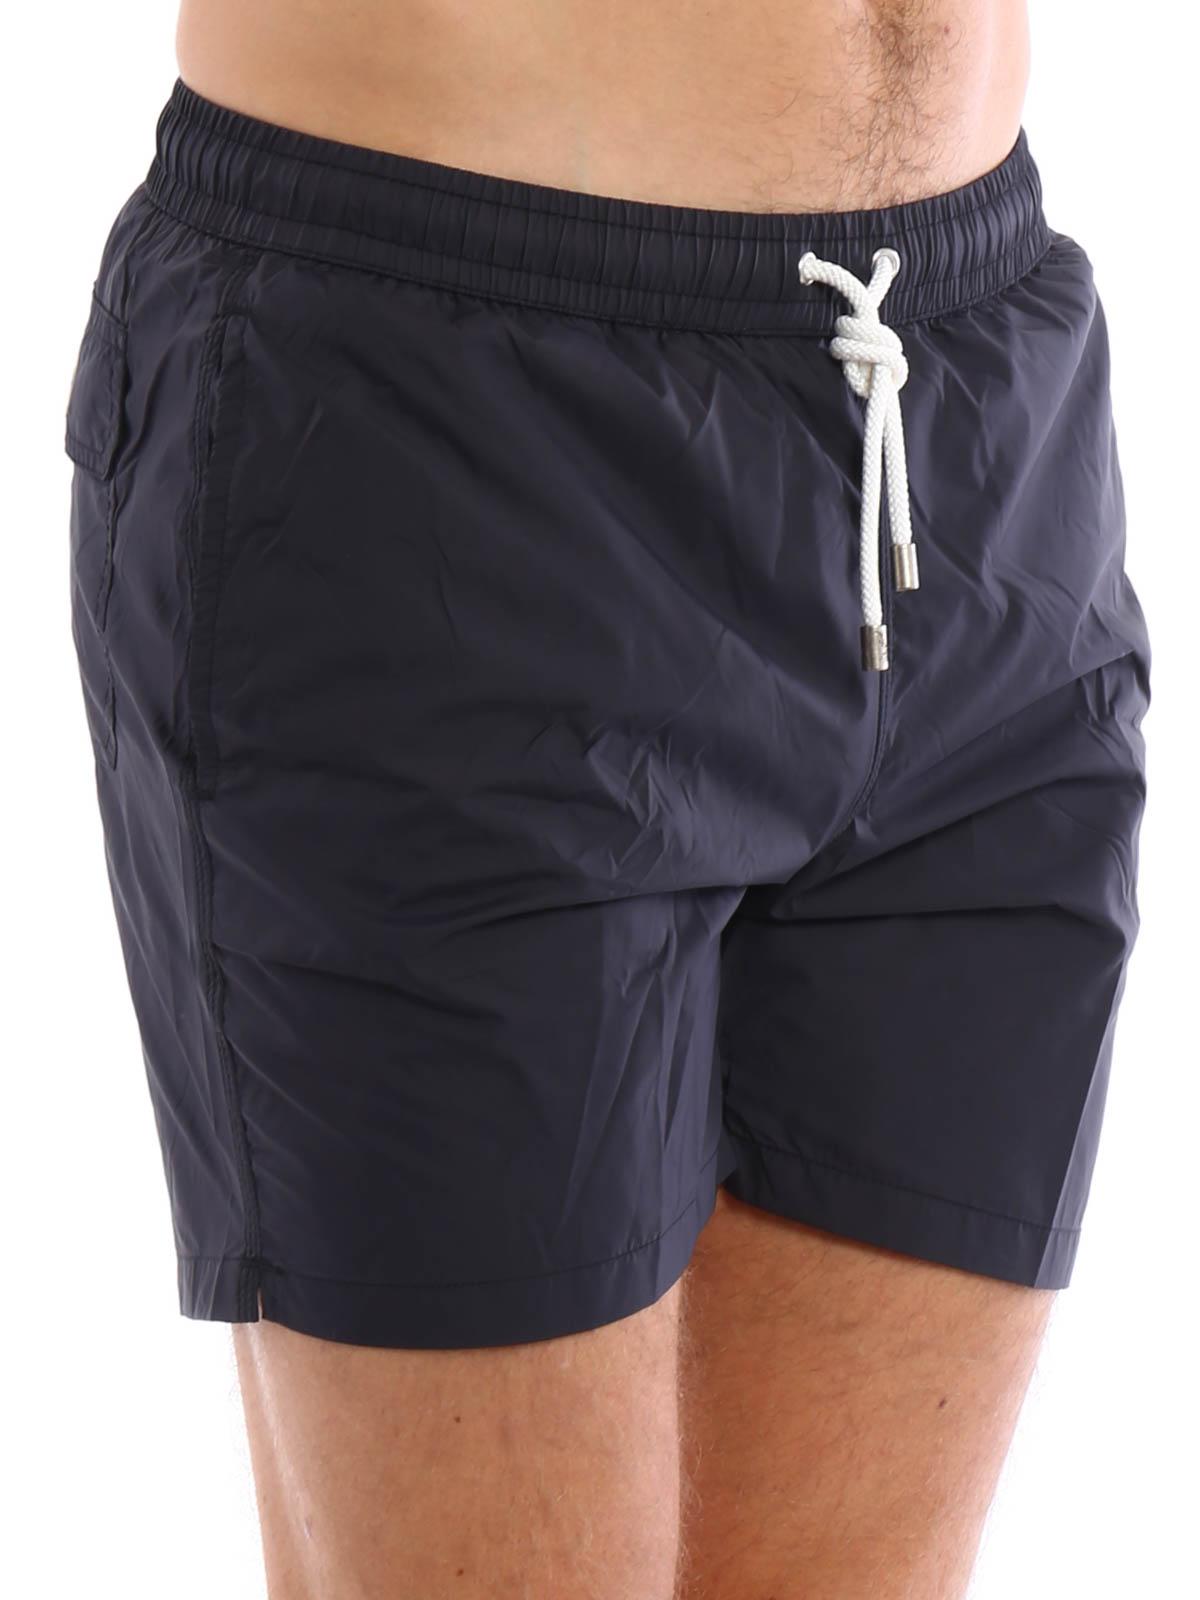 7f3b0caab8e3d iKRIX HARTFORD: Swim shorts & swimming trunks - Ultralight nylon swim shorts